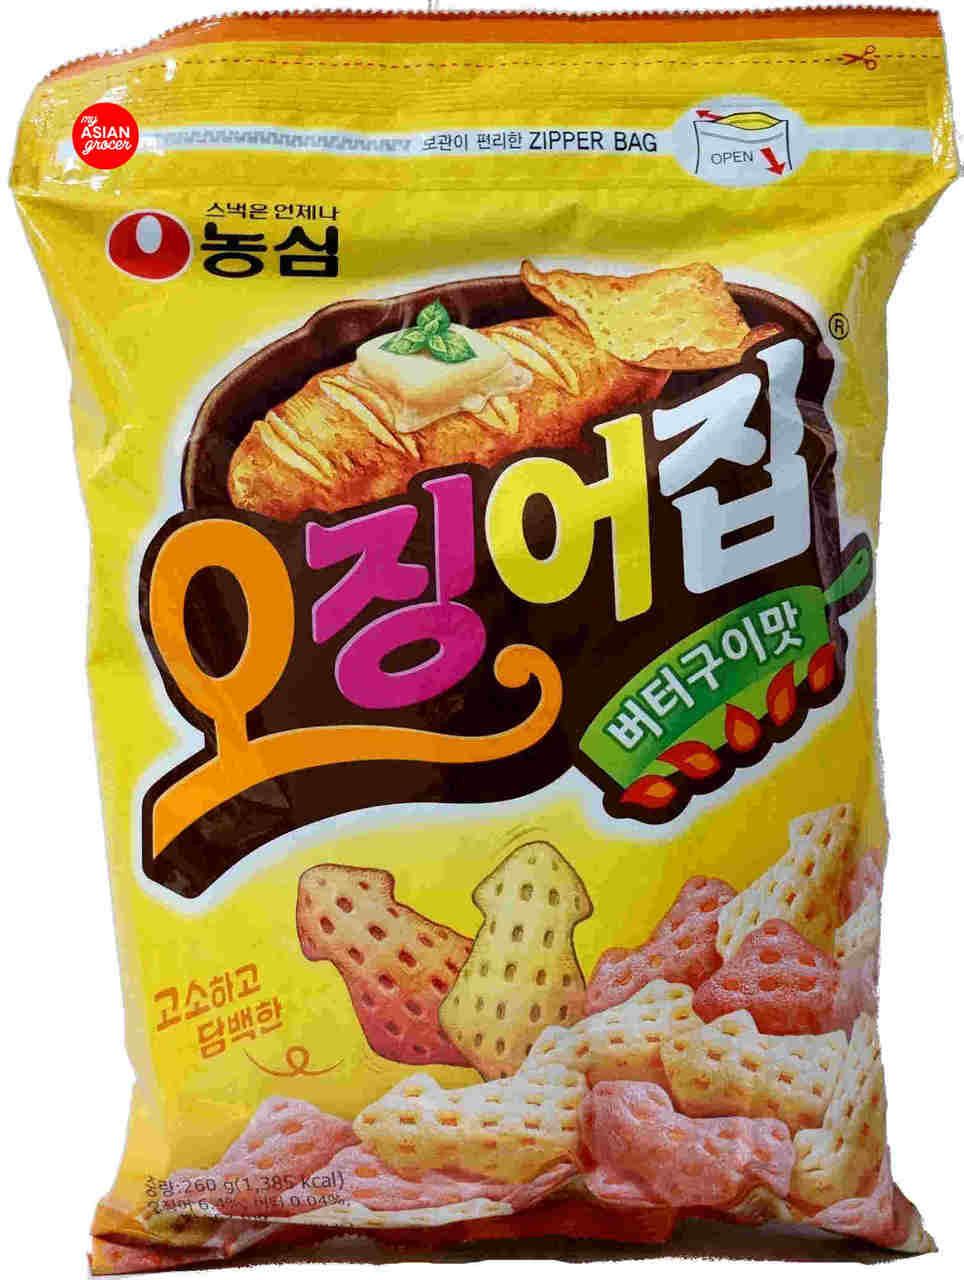 3c9357d4b1e5 Nong Shim Cuttlefish Roasted Butter Chips 260g - My Asian Grocer